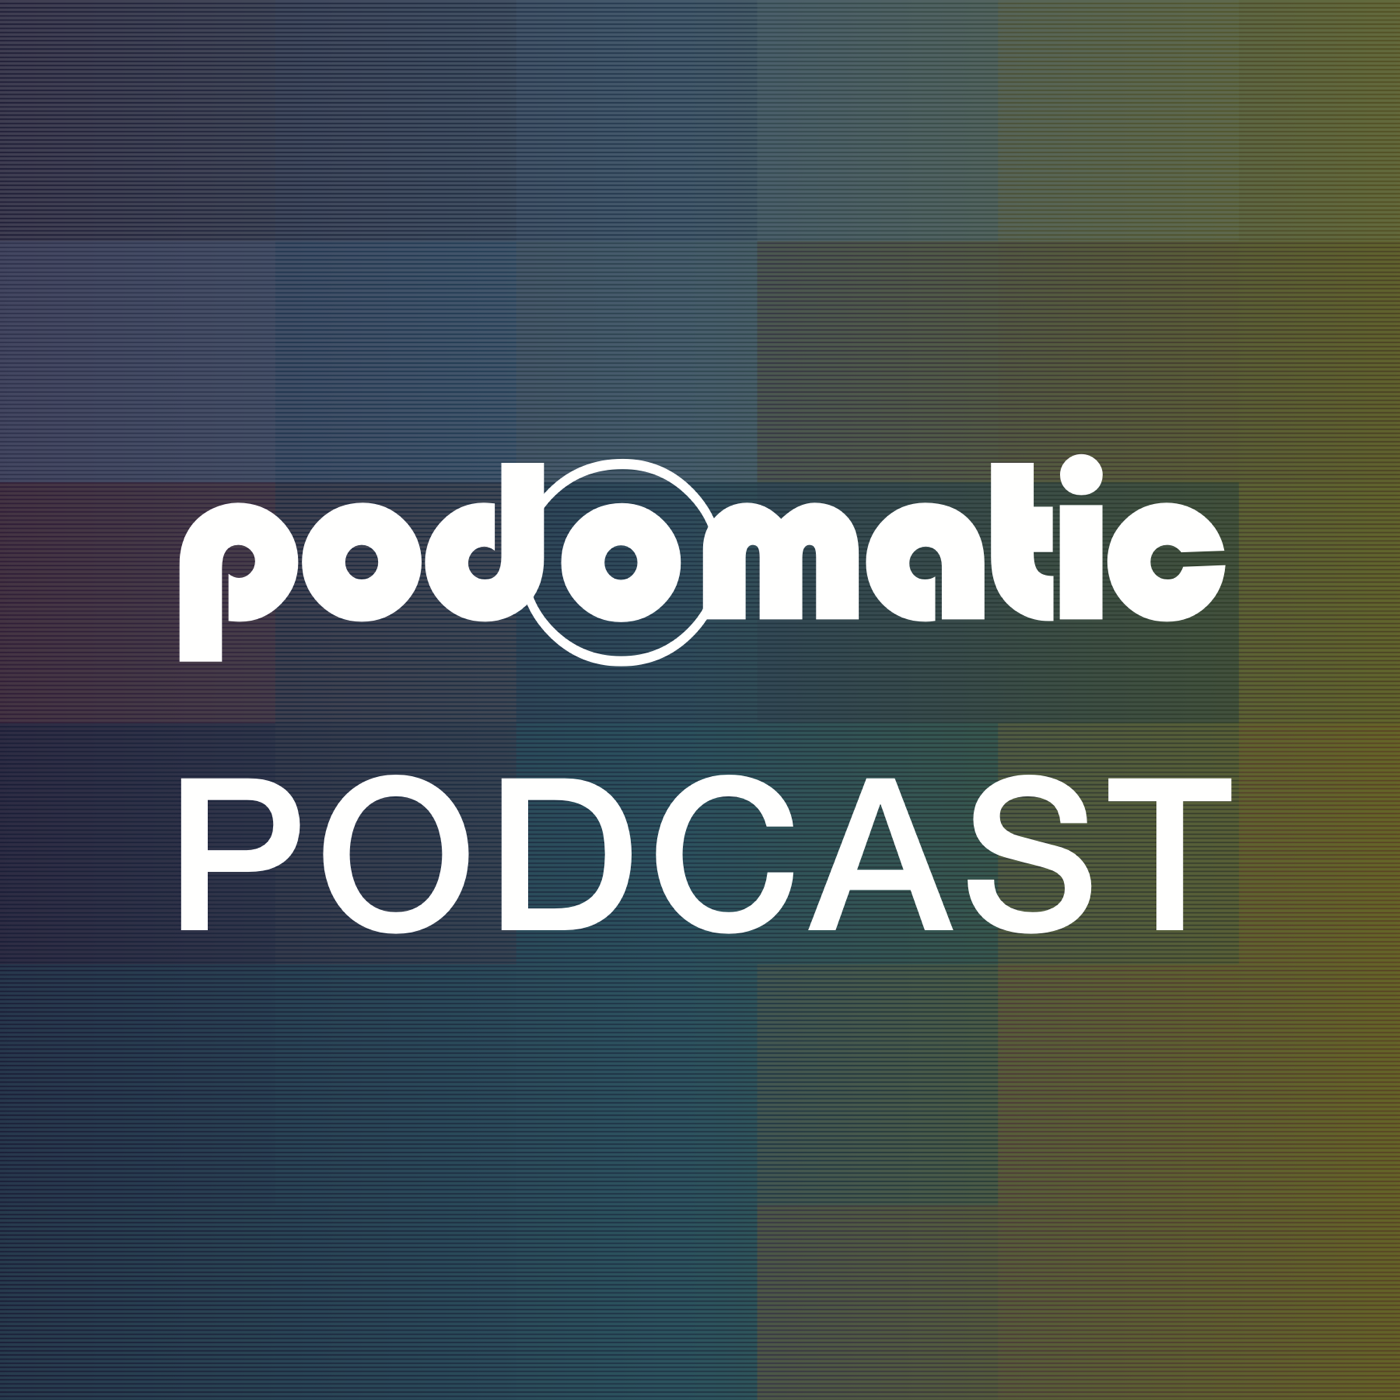 Logan Wickersham's Podcast